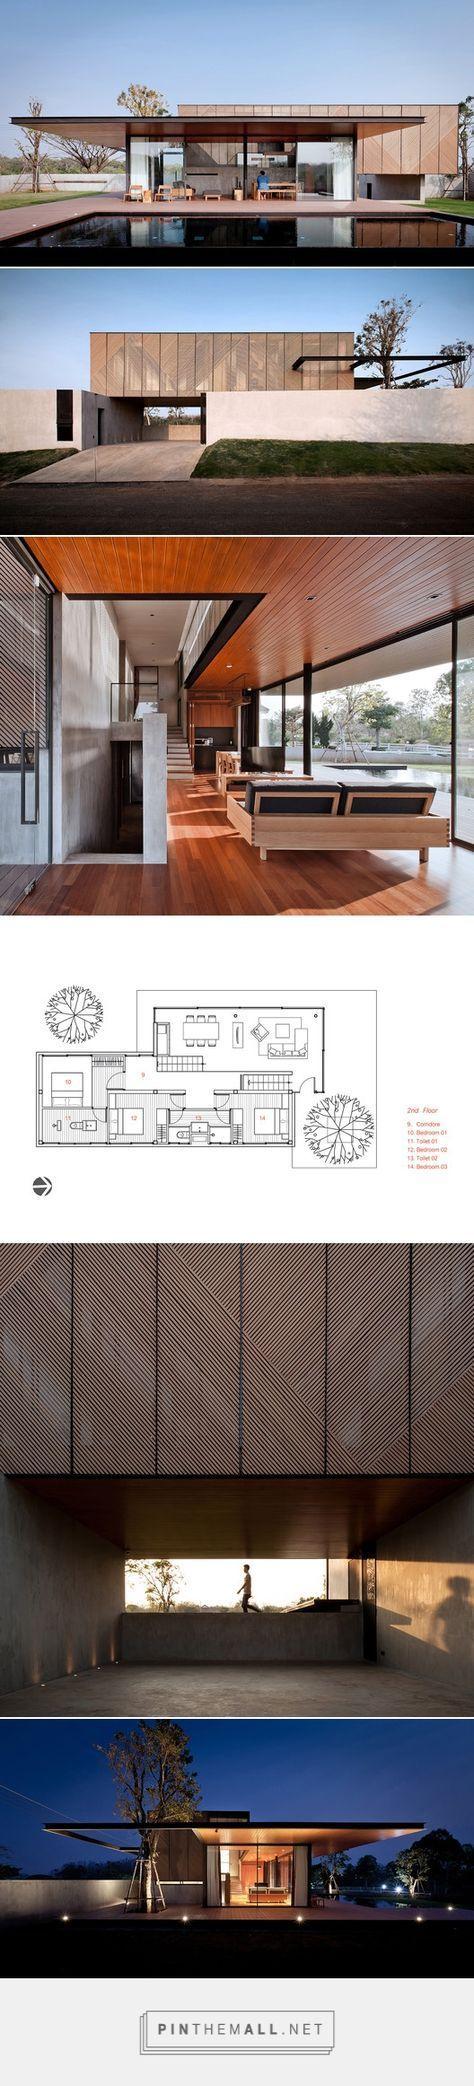 KA House / IDIN Architects | ArchDaily - created via http://pinthemall.net